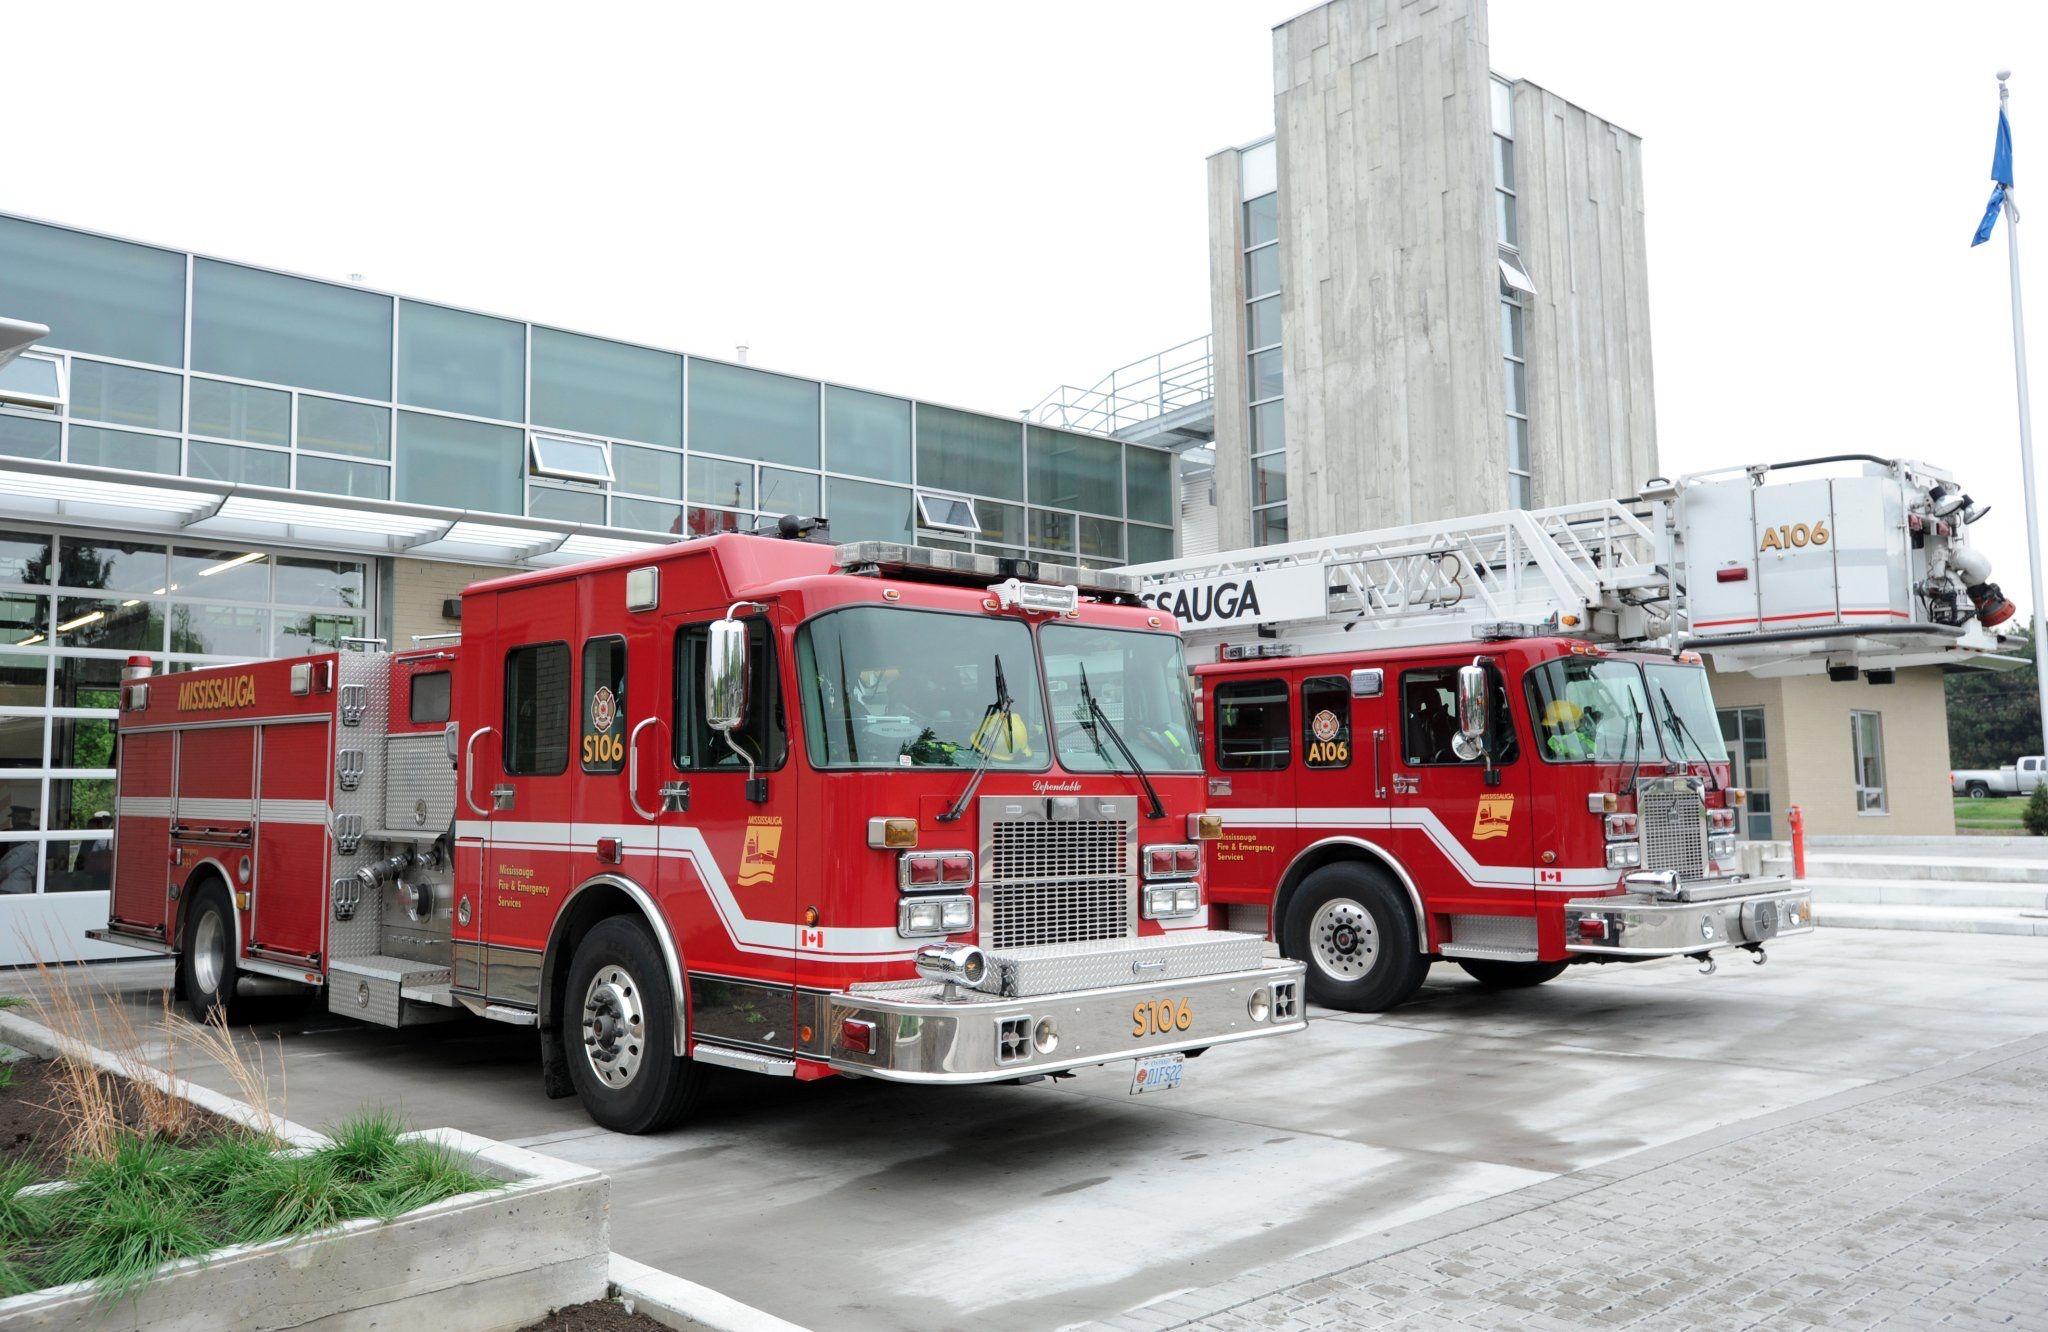 Mississauga fire dept ontario ca fire trucks fire dept